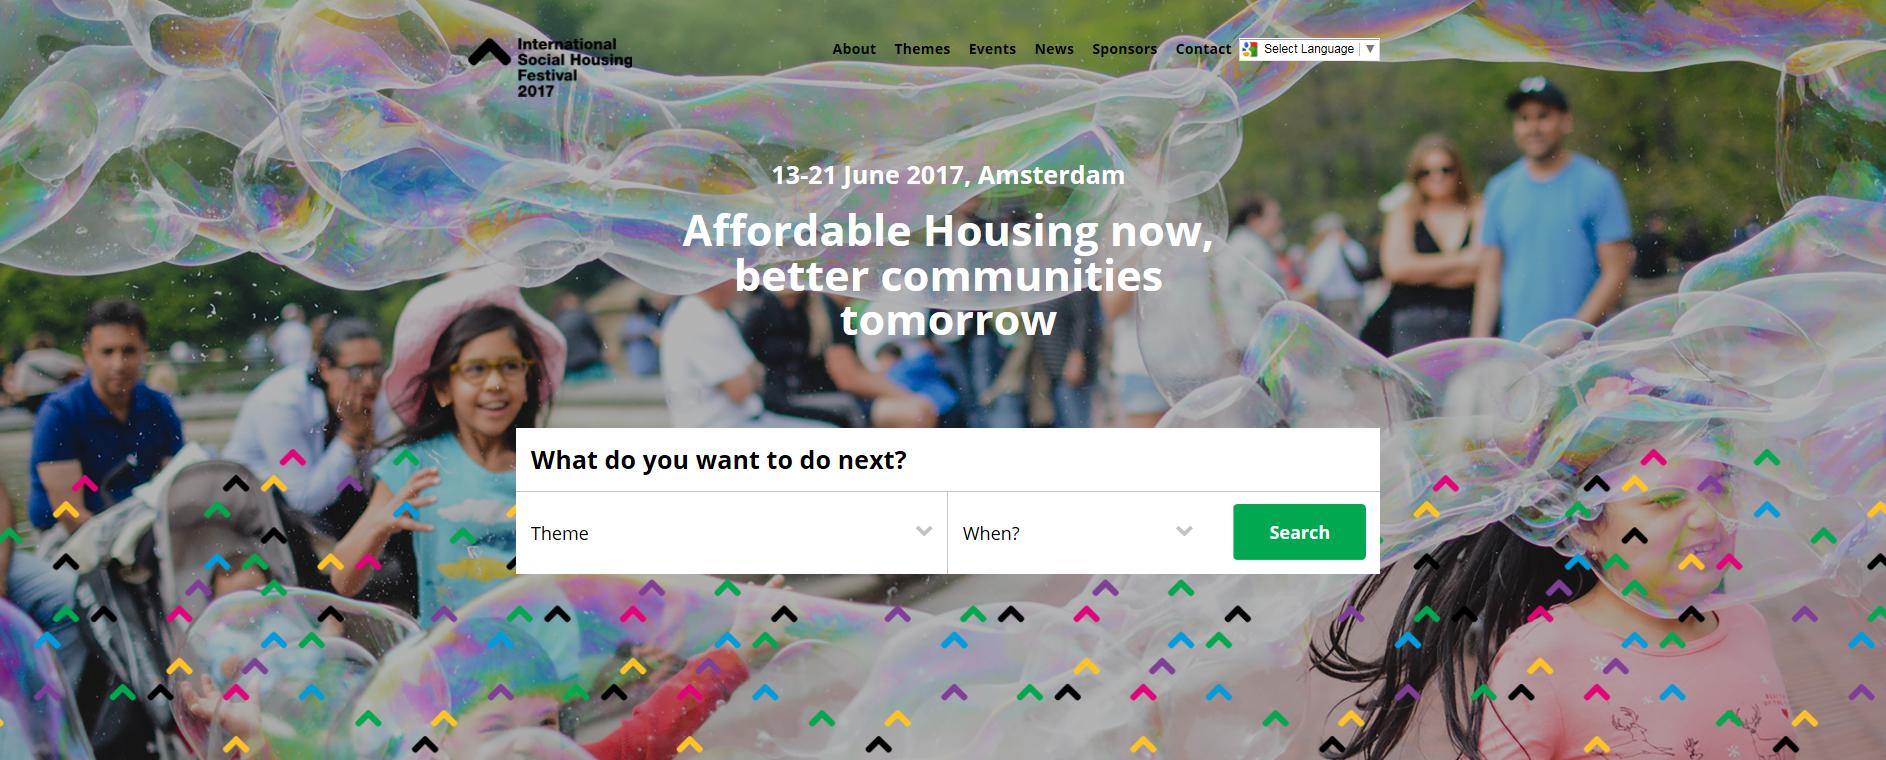 Affordable housing Amsterdam June 2017